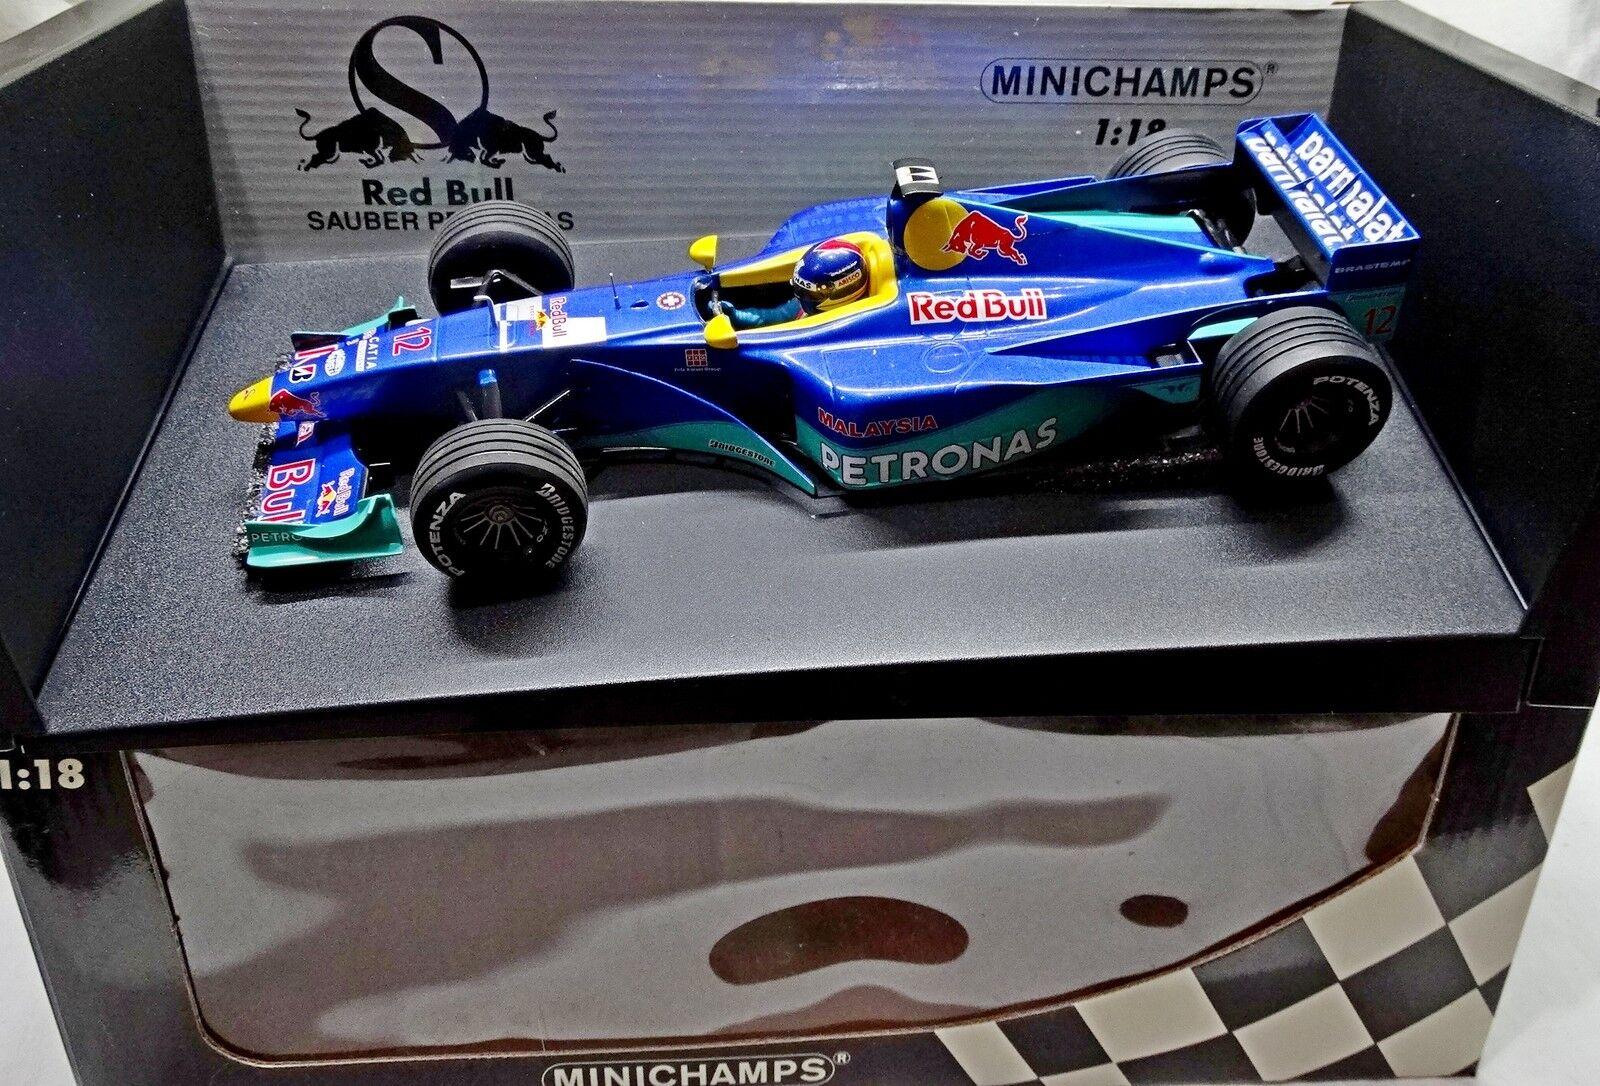 Red Bull Sauber c18 f1 1999 Pedro diniz Minichamps RARE Built 1 18 no spark